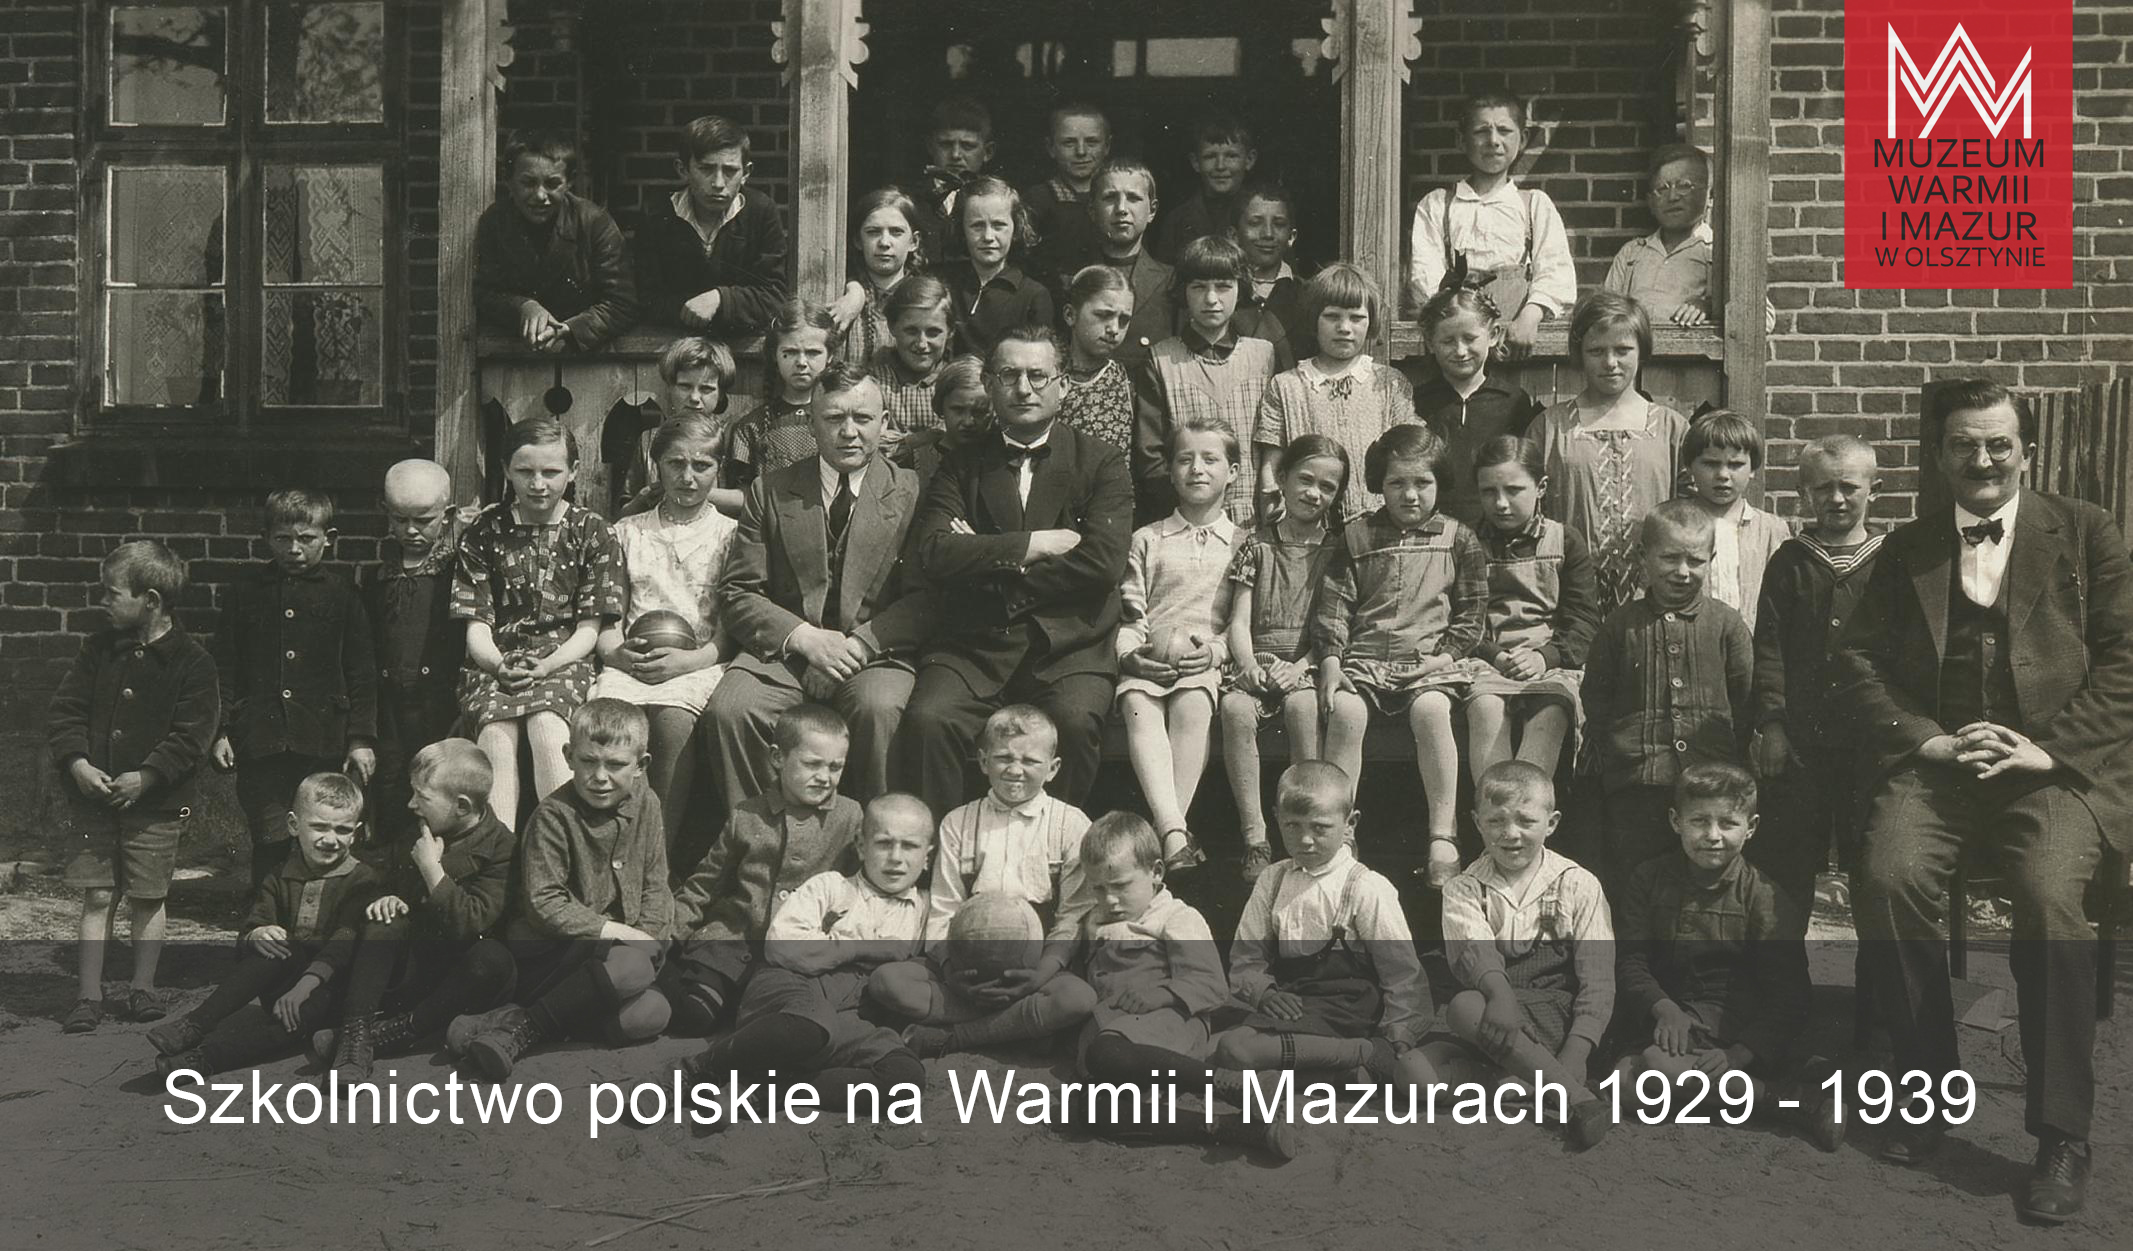 https://m.wmwm.pl/2019/09/orig/szkolnictwo-6476.jpg